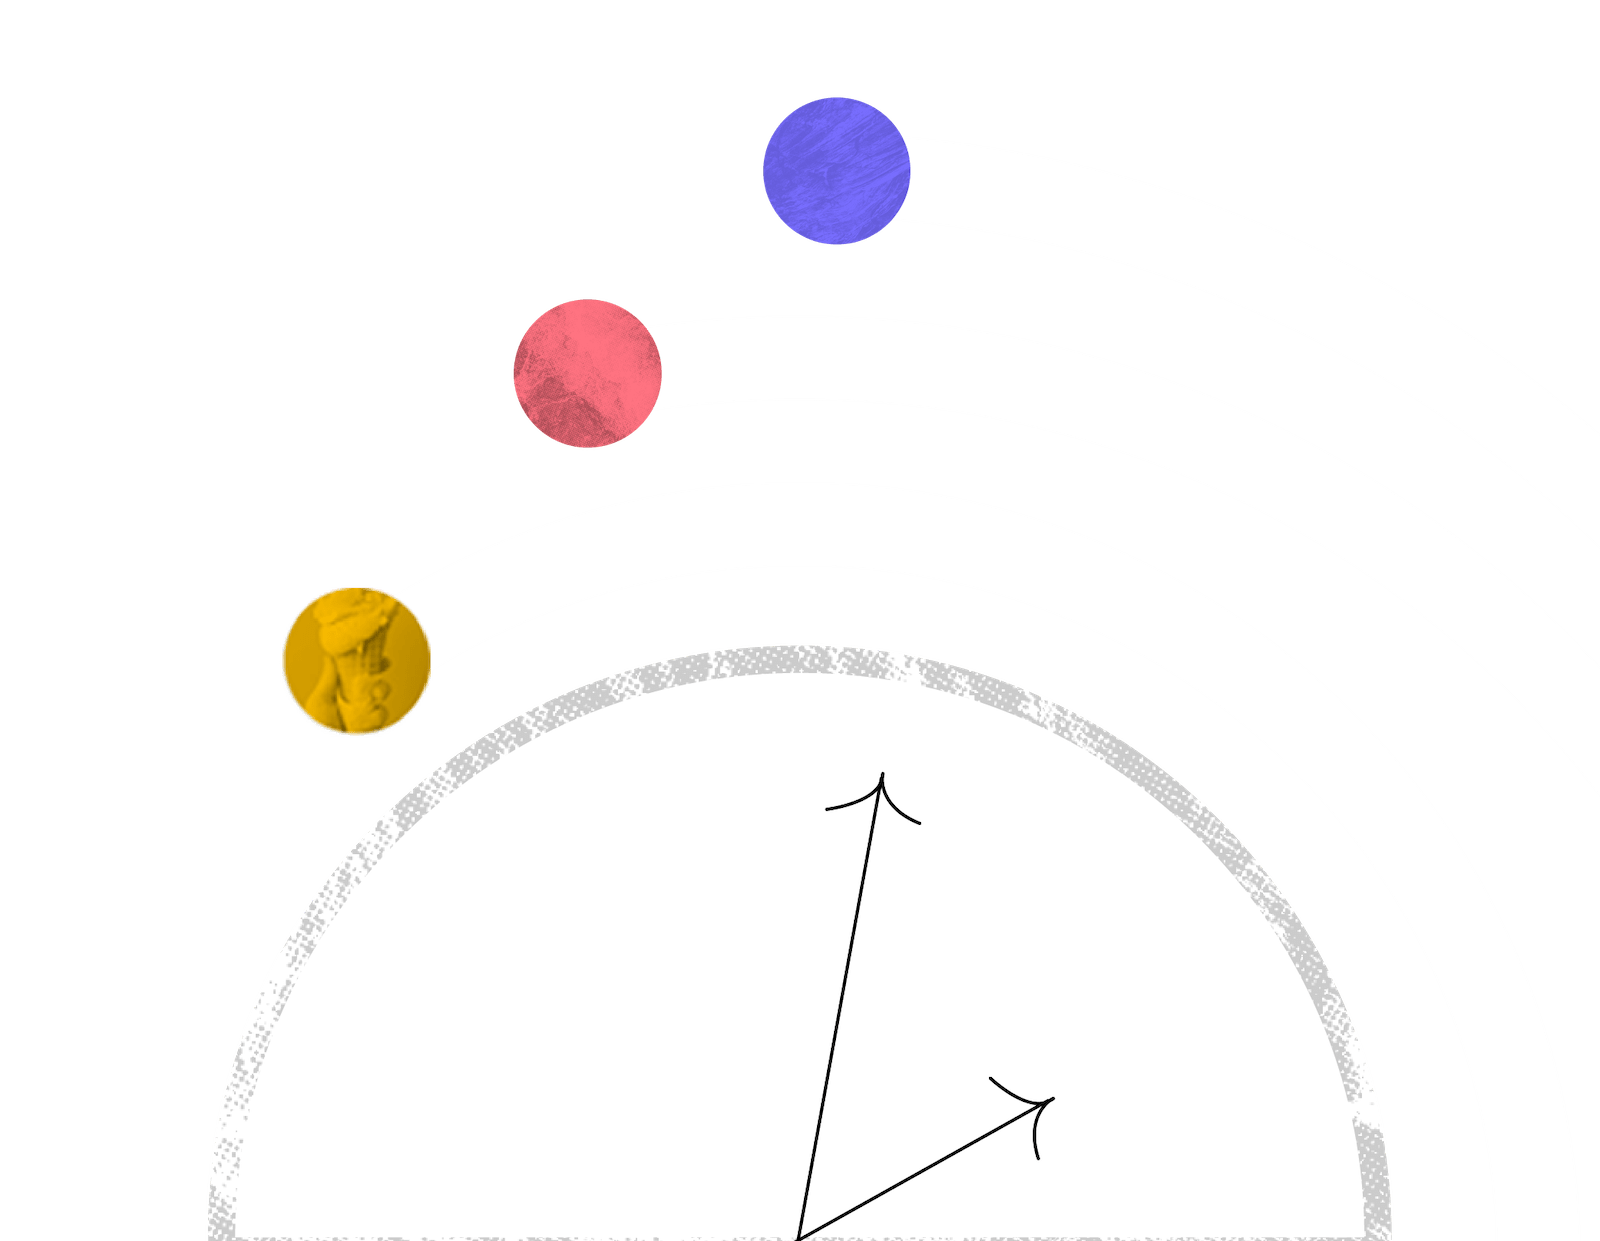 Asana ワークマネジメントプラットフォーム